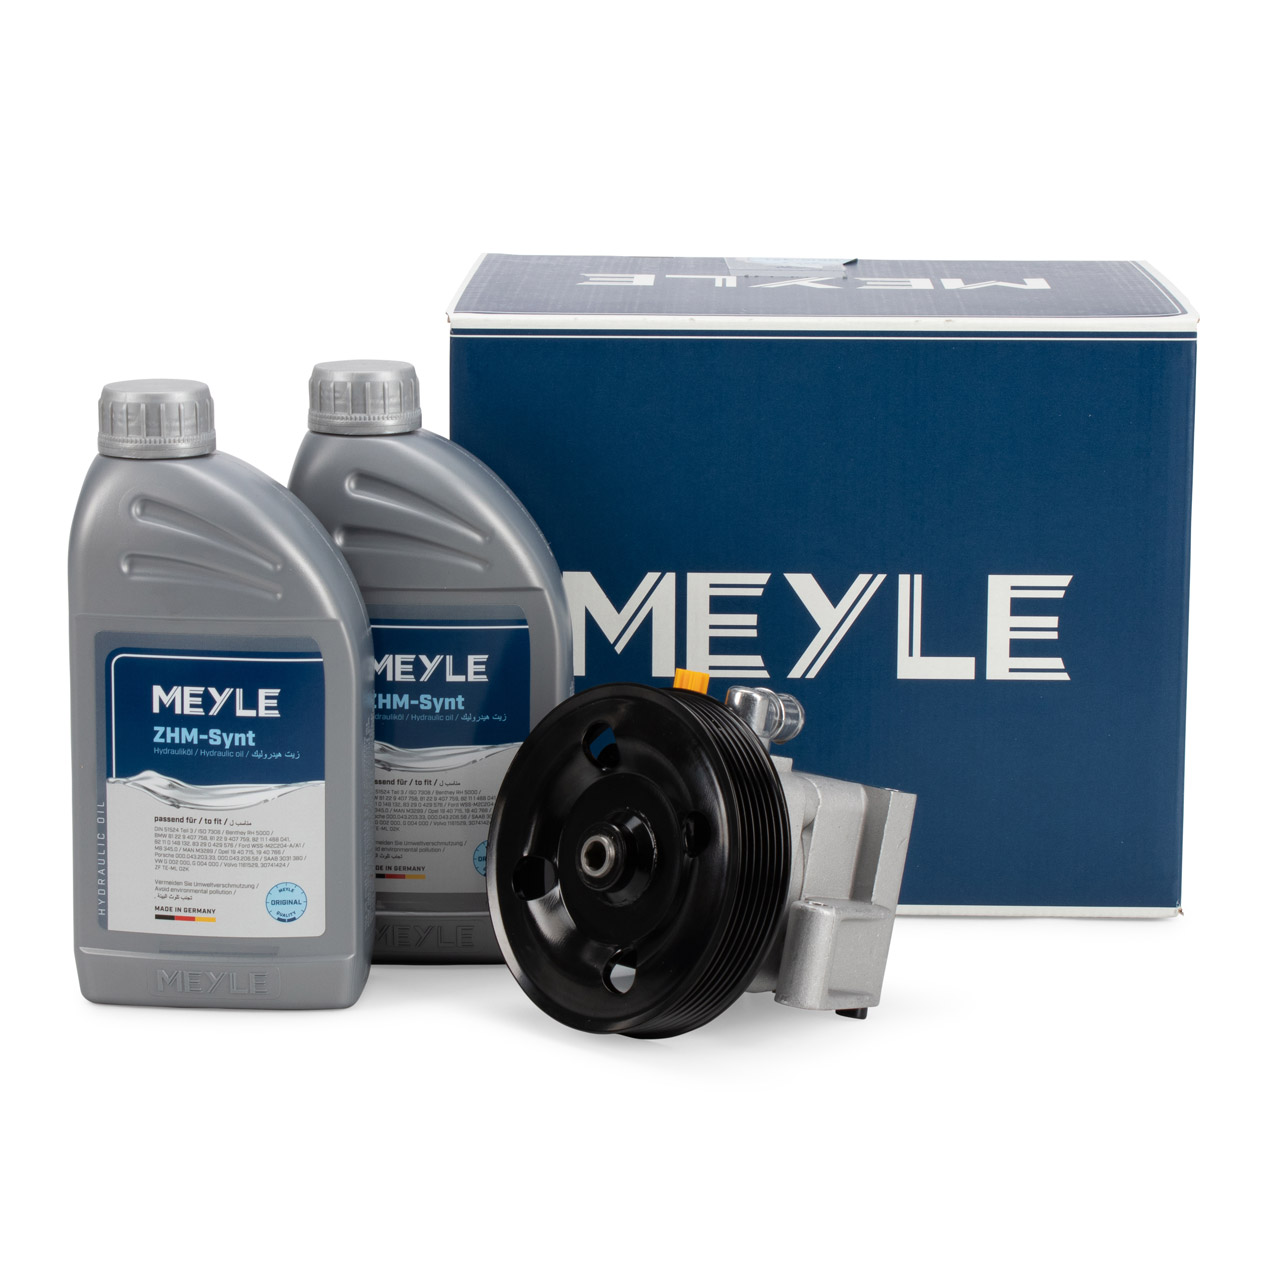 MEYLE Hydraulikpumpe + 2L Hydrauliköl FORD C-Max Focus 2 1.6-2.0 VOLVO C30 S40 2 V50 1.6